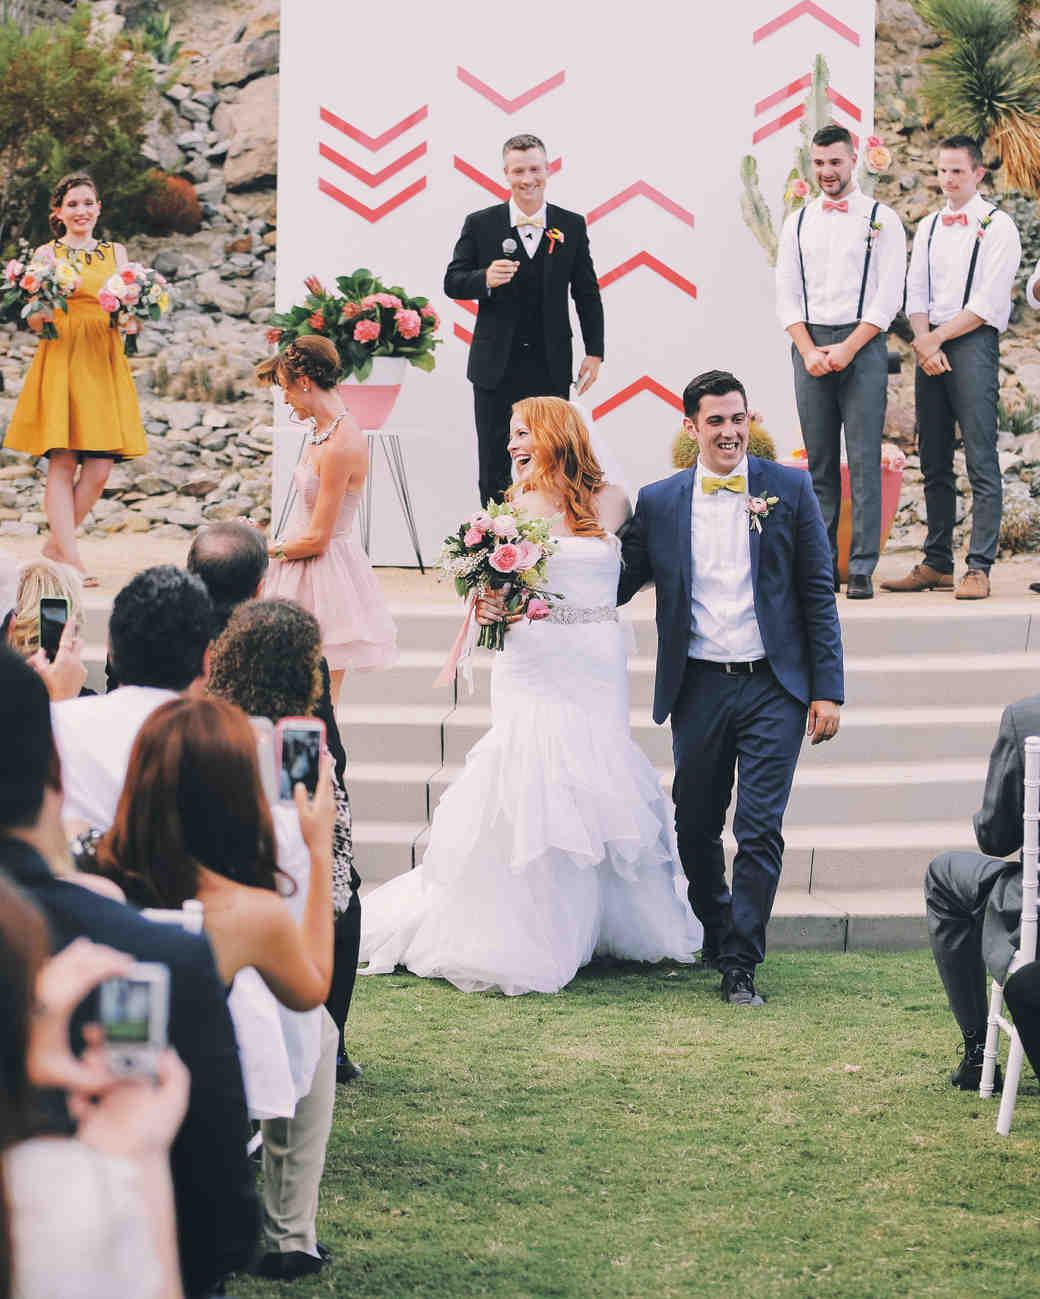 katie-brian-wedding-recessional-3598-s111885-0515.jpg